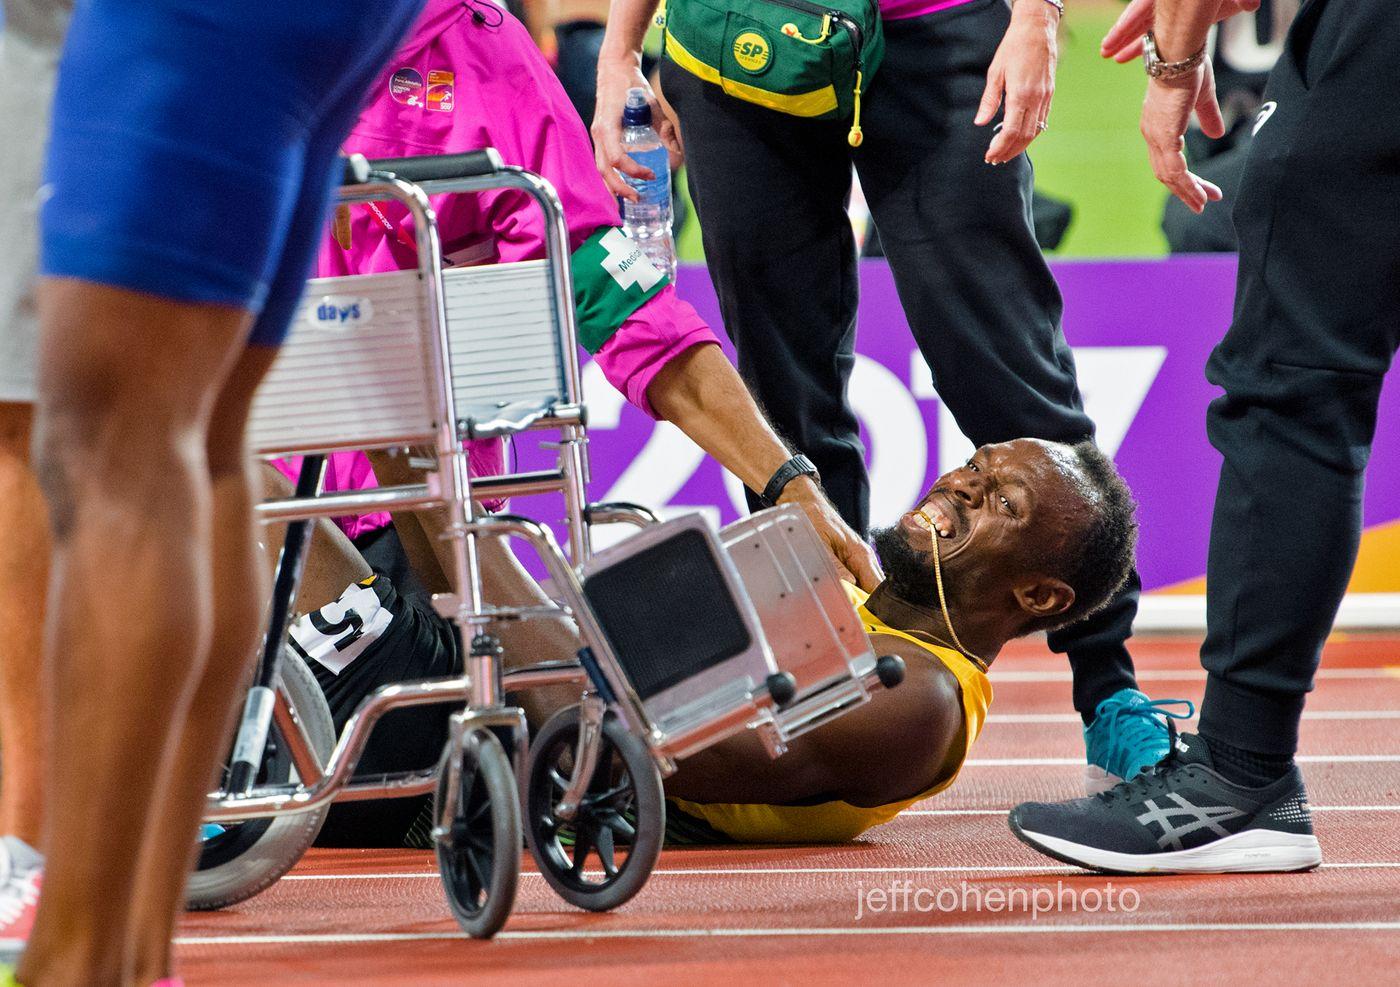 2017-IAAF-WC-London-night-9-bolt-down-4x100--3452--jeff-cohen-photo--web1.jpg